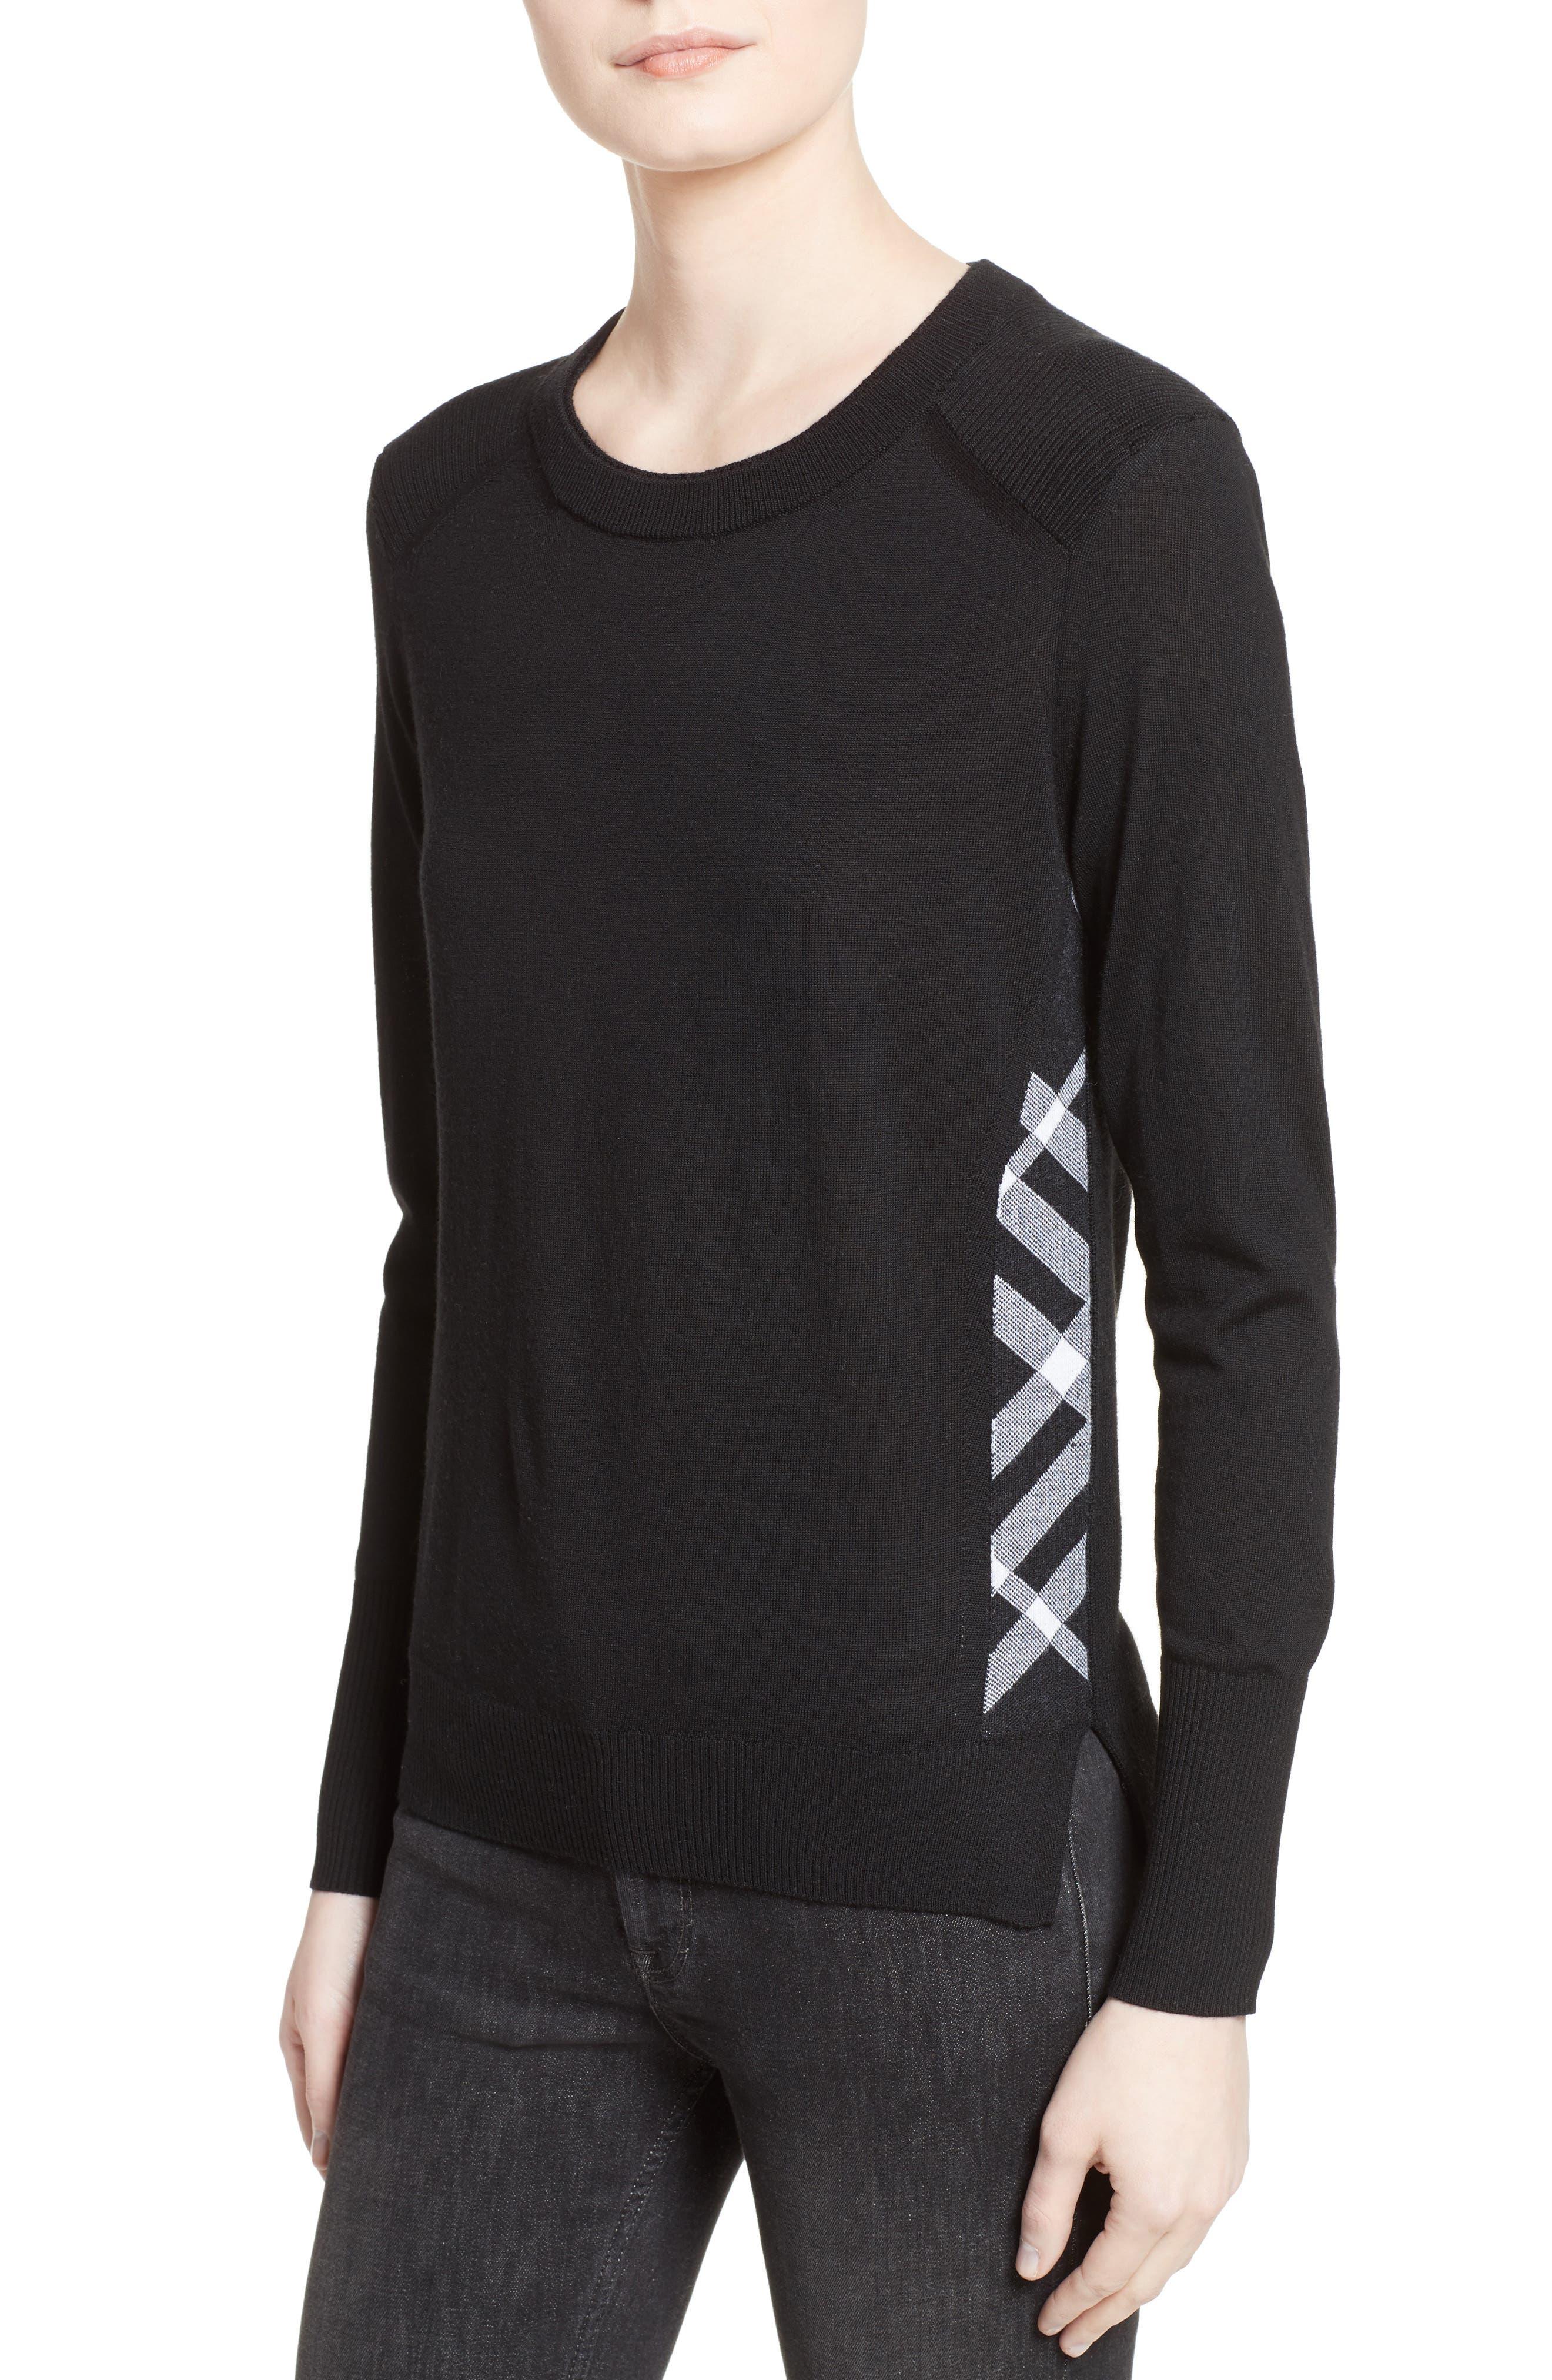 Meigan Merino Wool Sweater,                             Alternate thumbnail 4, color,                             001